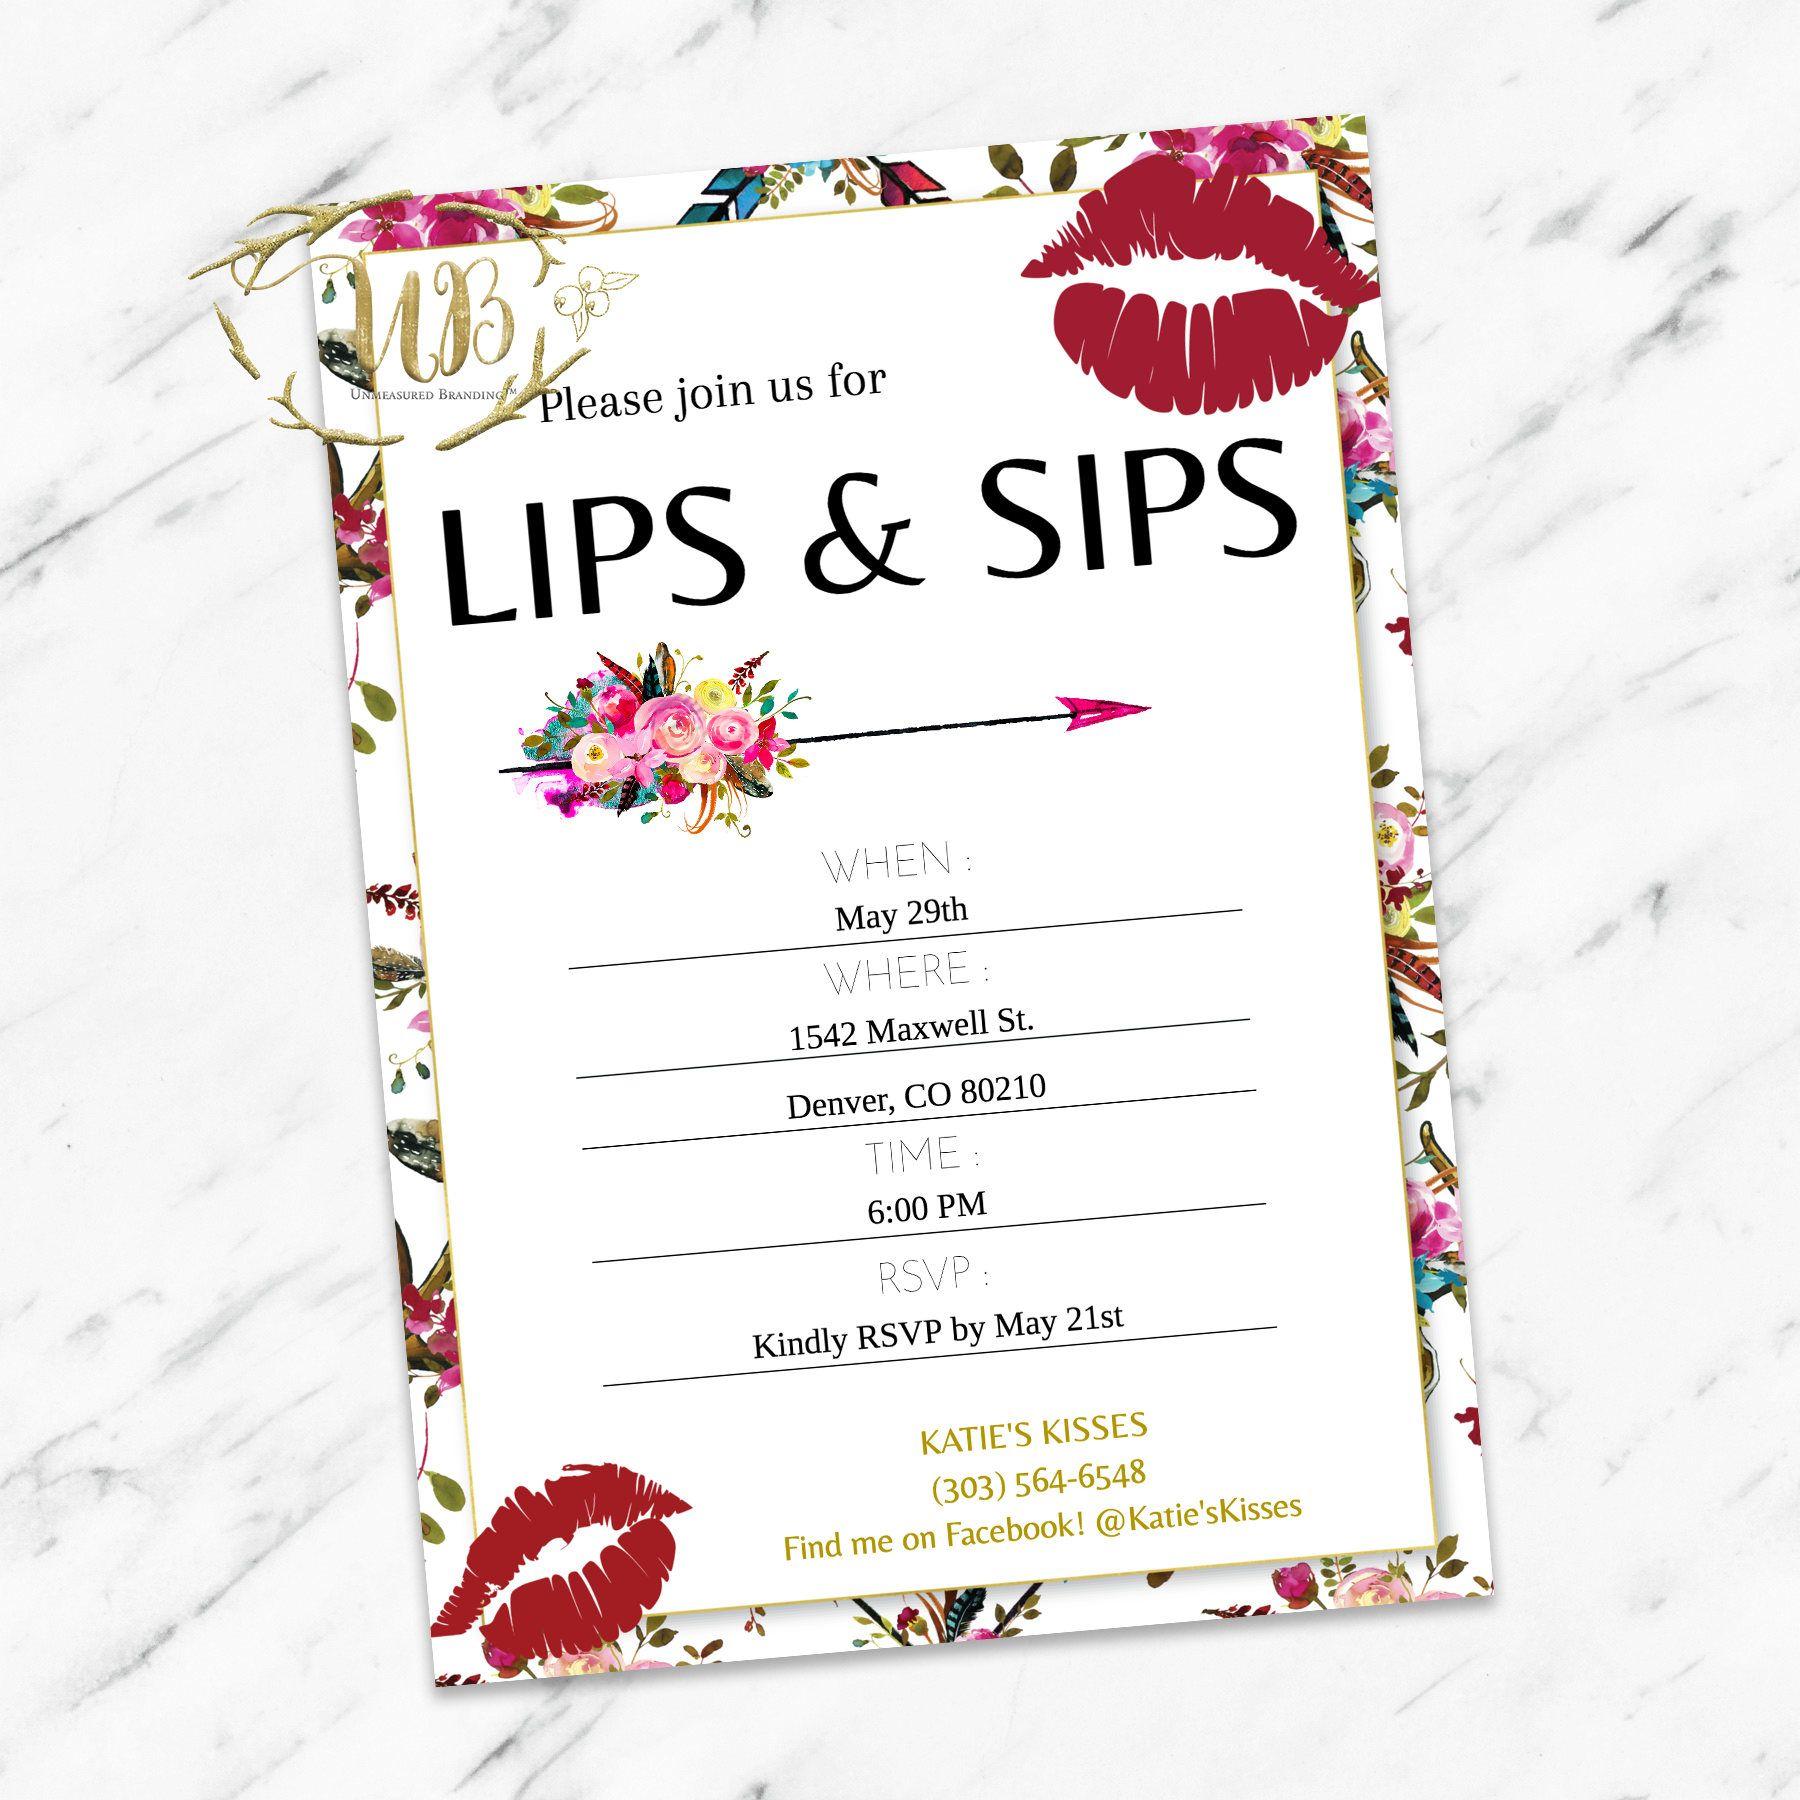 LipSense Lip and Sip Party Invitation | LIPSENSE & MAKEUP ...